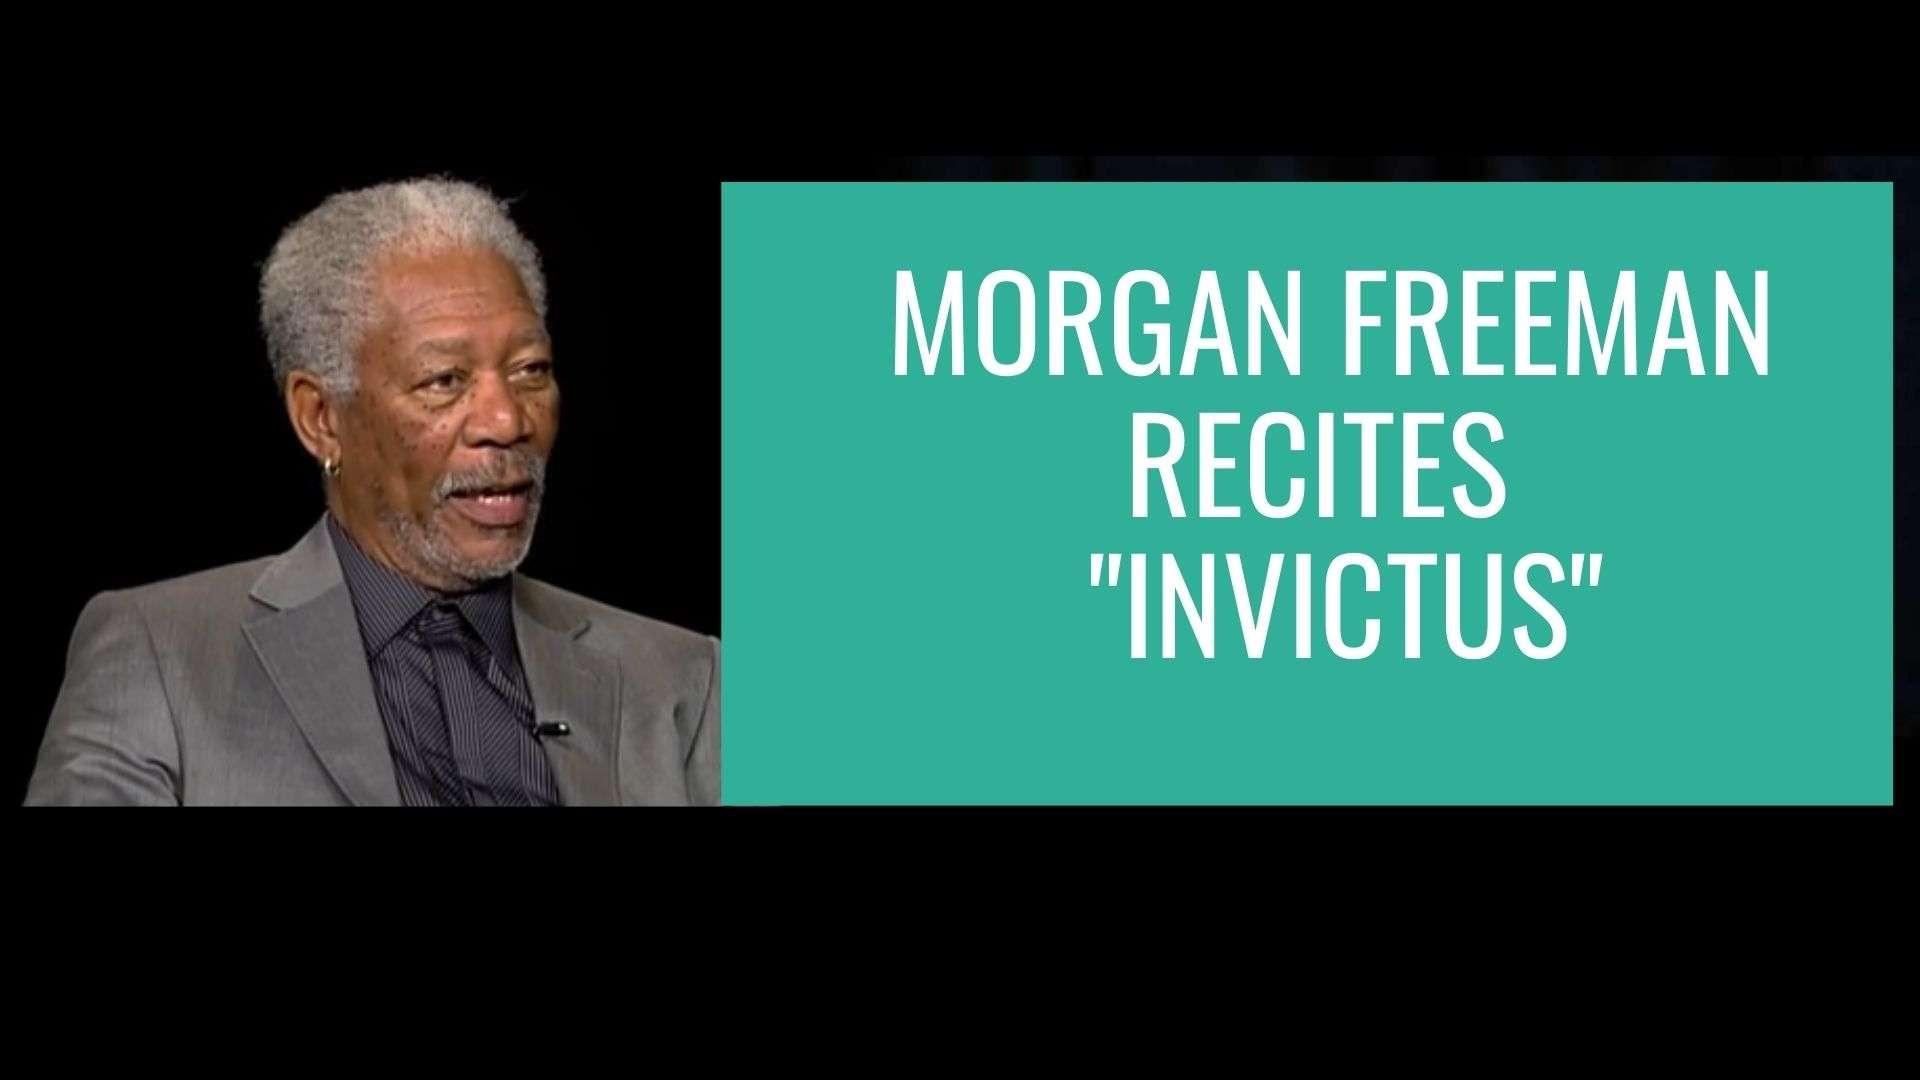 Morgan Freeman recites Invictus_Sweat Your Assets